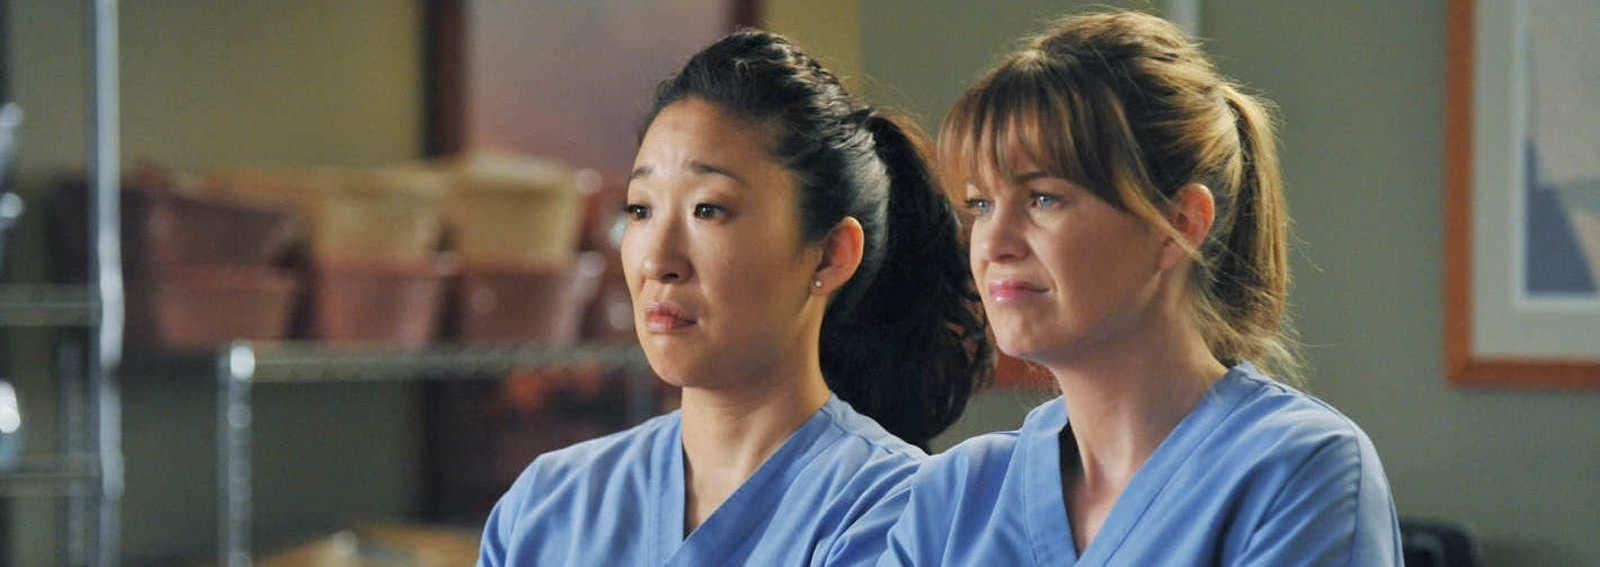 Grey's Anatomy coppia